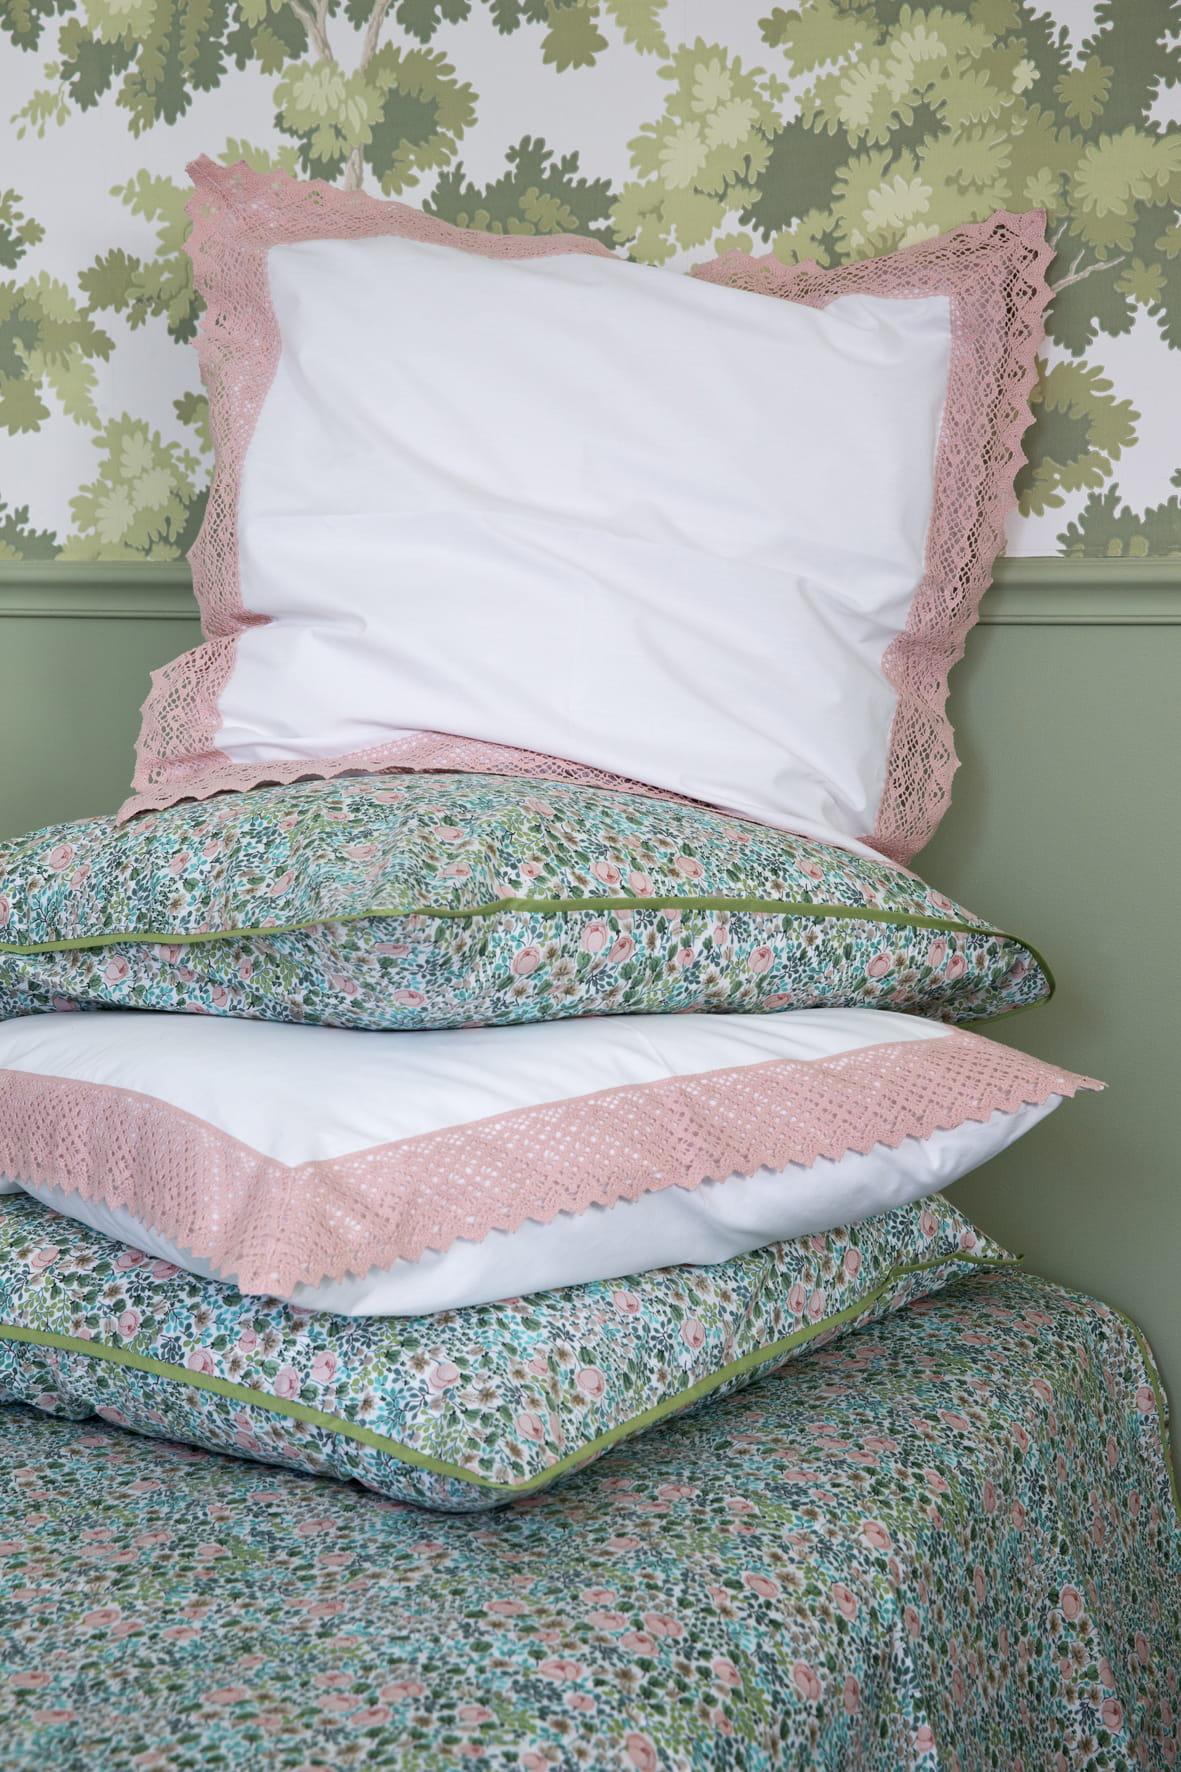 linge de lit may wedding de bouchara linge de lit a sent le printemps. Black Bedroom Furniture Sets. Home Design Ideas